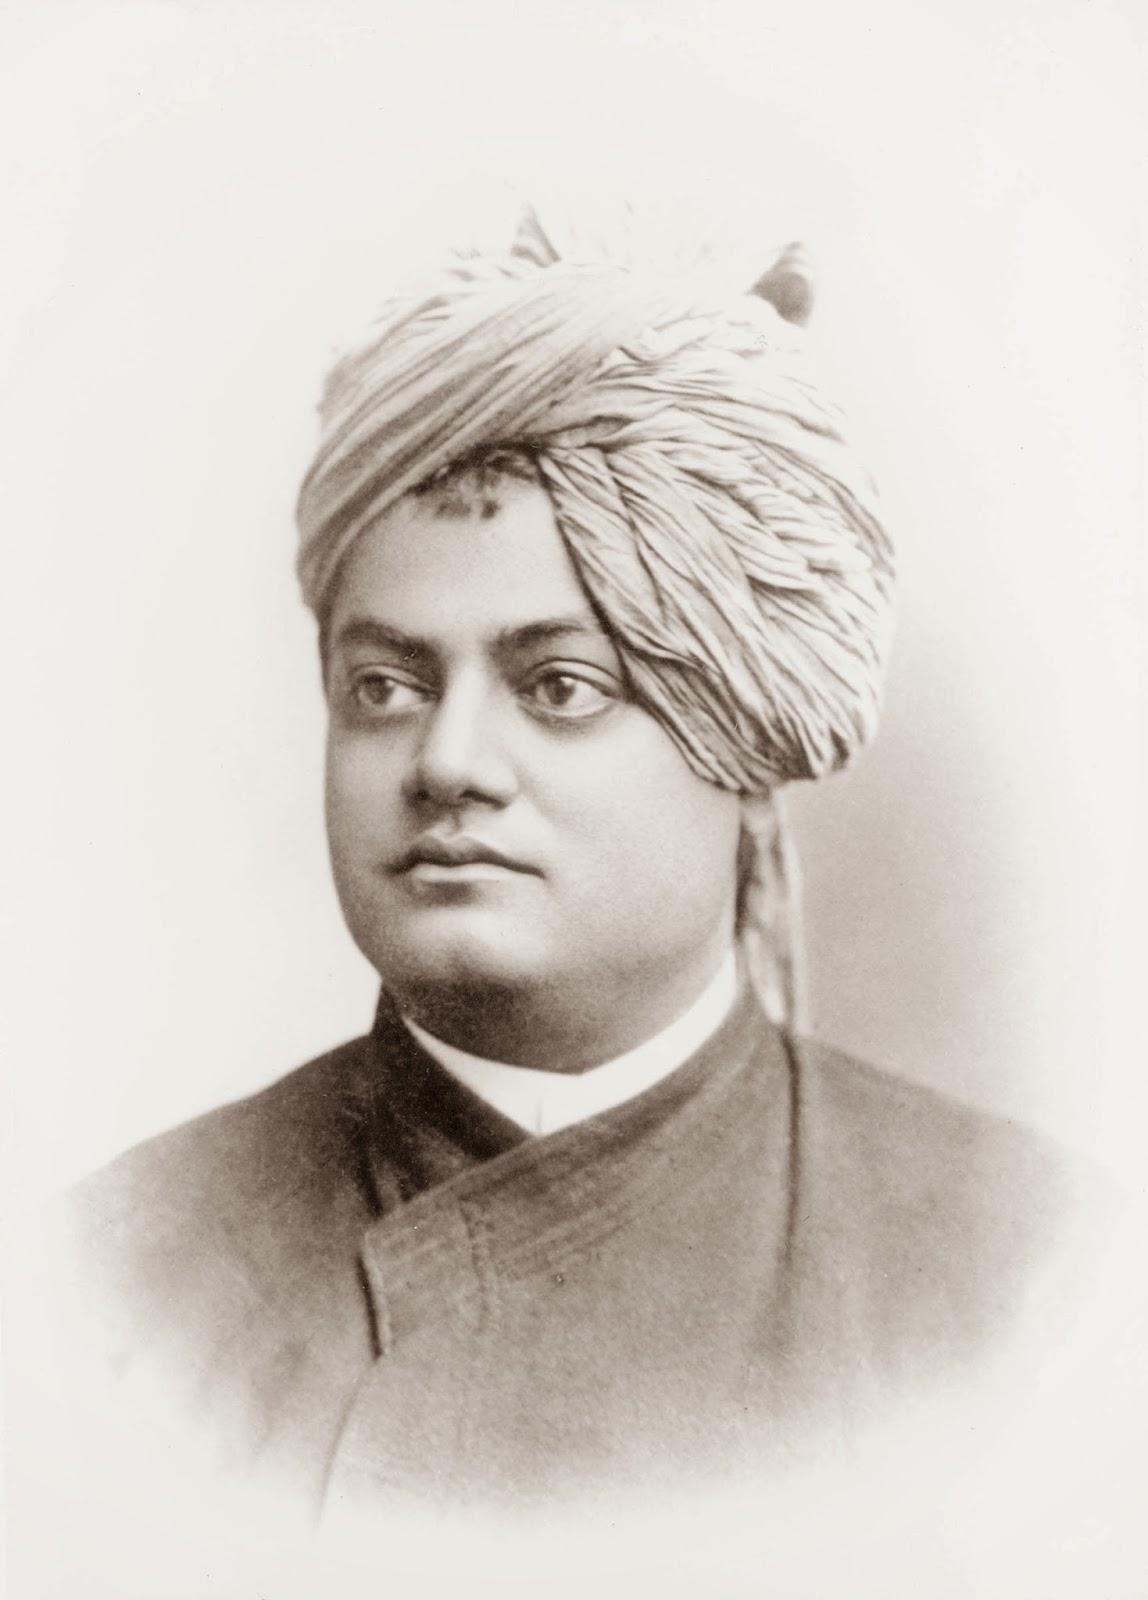 swami vivekanand Hindi PDF Books in Download - 44Books